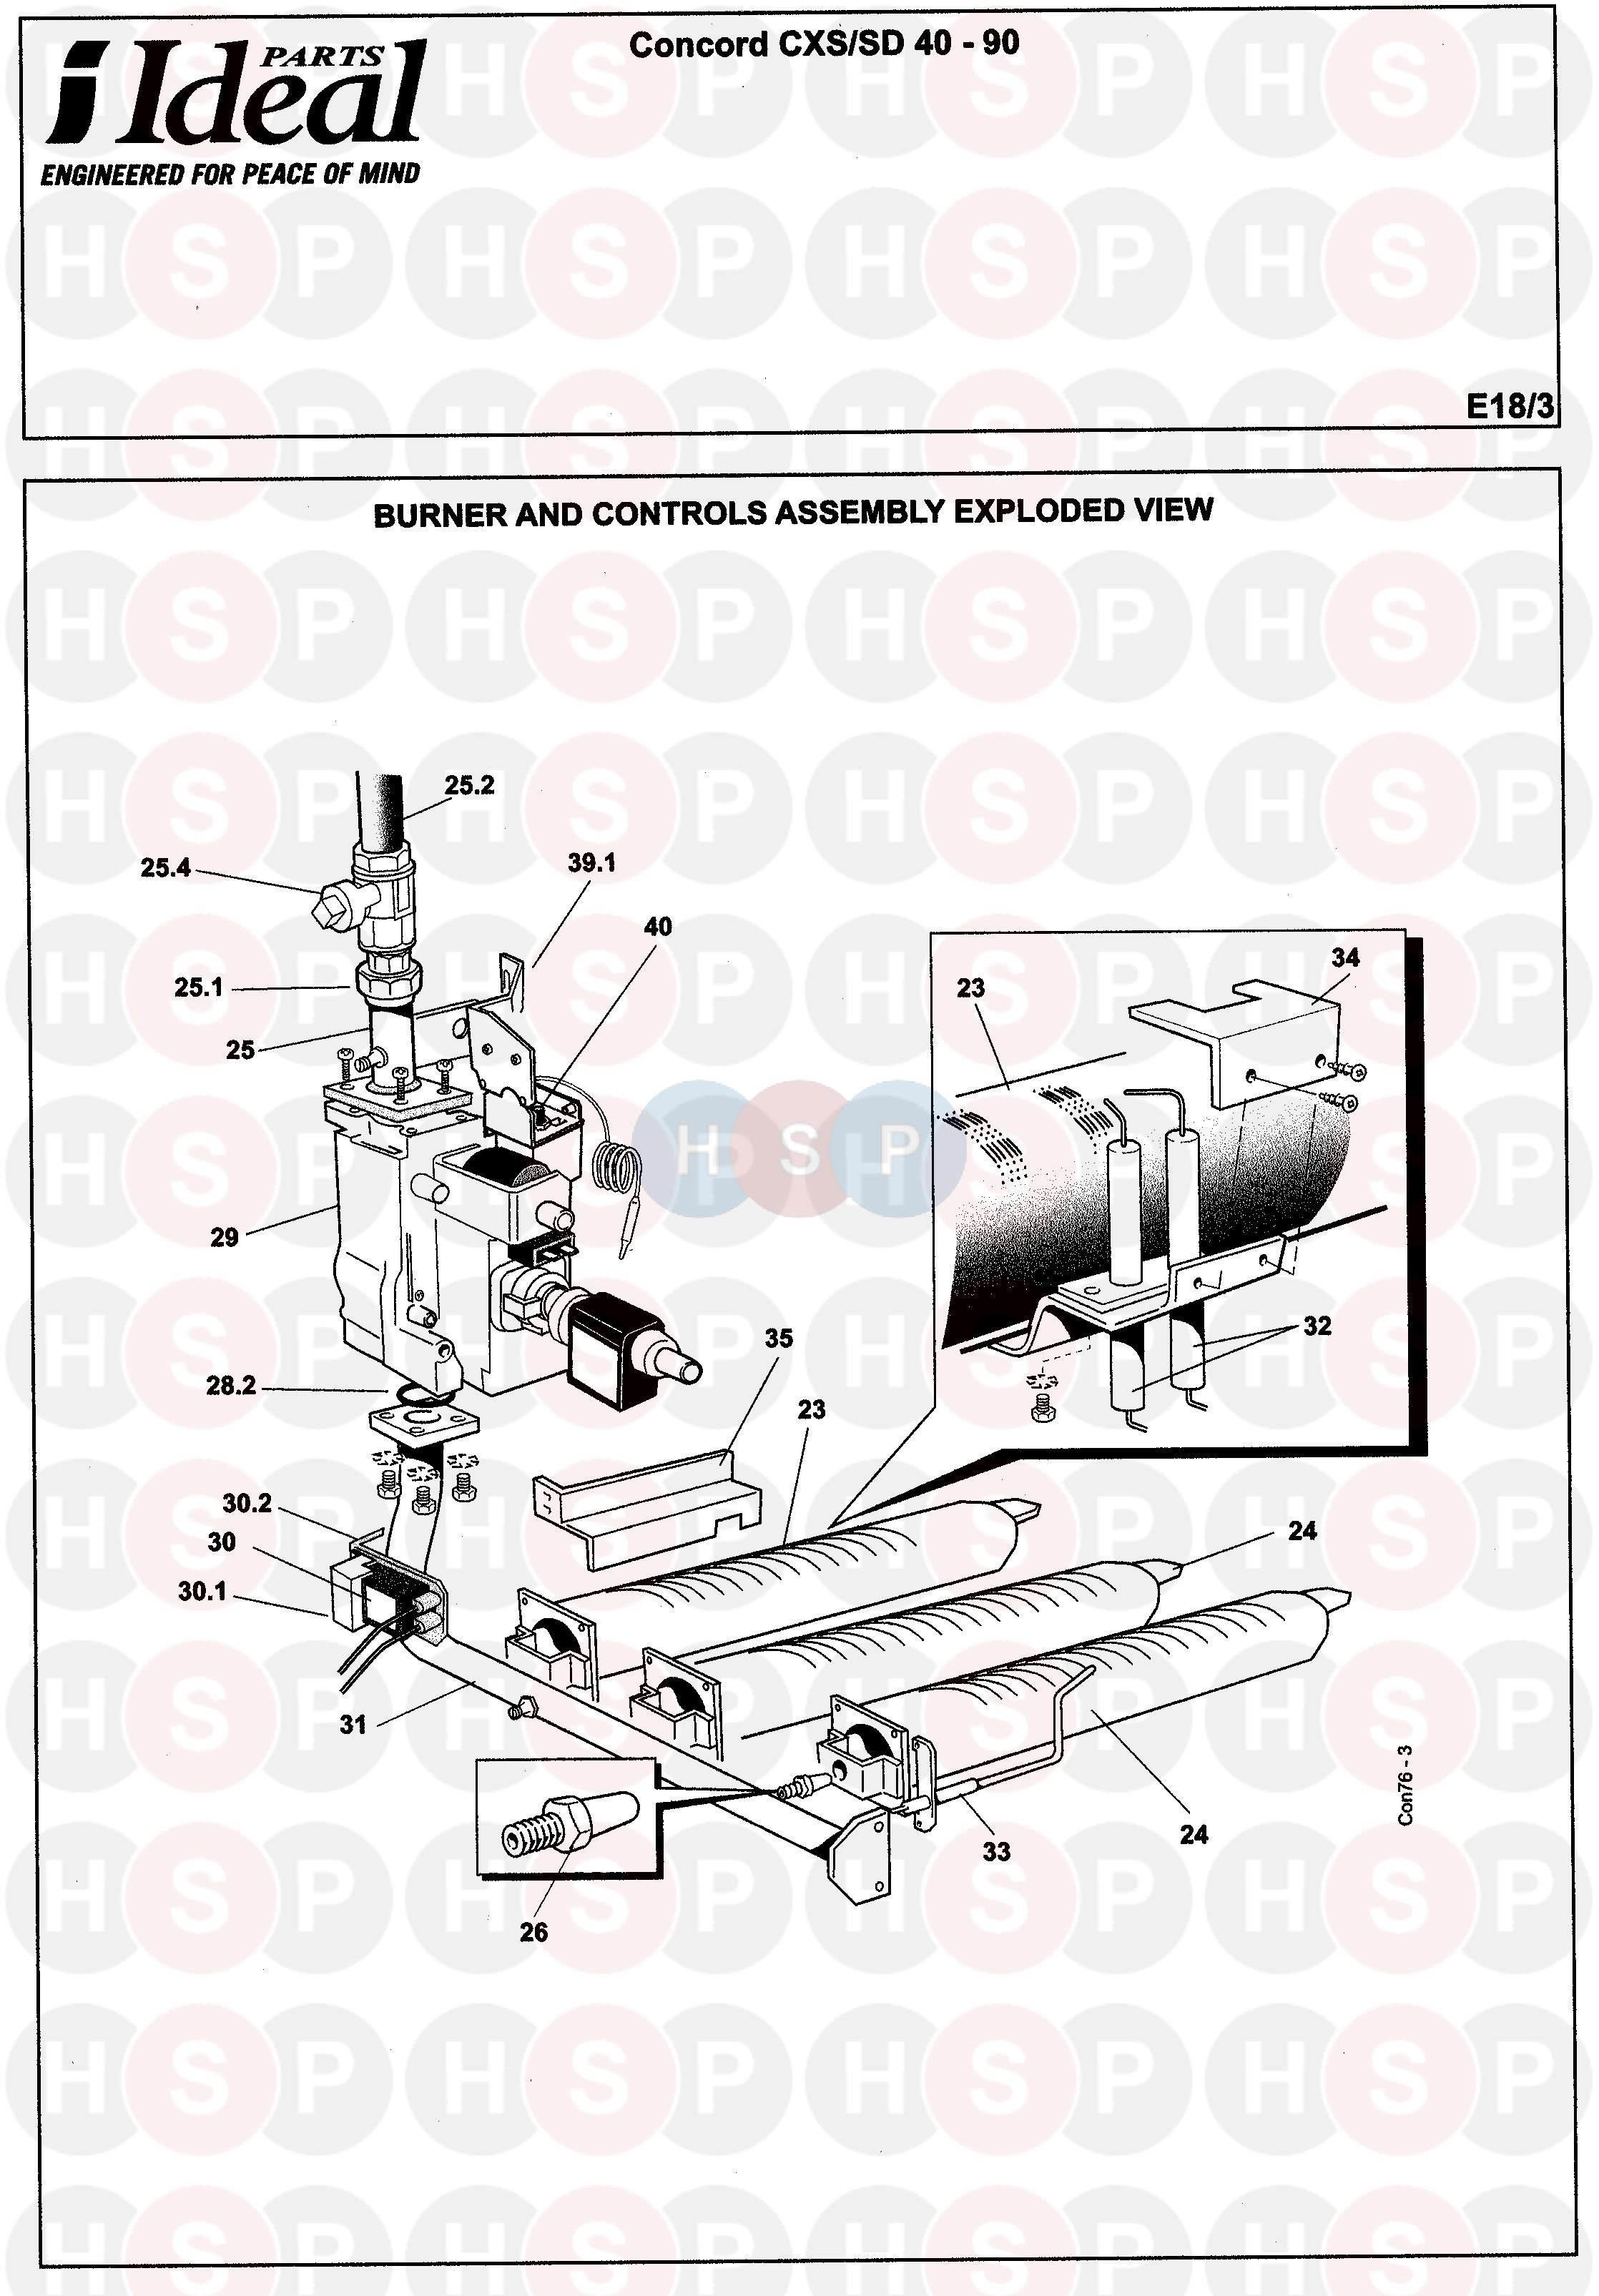 ideal concord cxsd 40 120 gas assembly 1 diagram. Black Bedroom Furniture Sets. Home Design Ideas